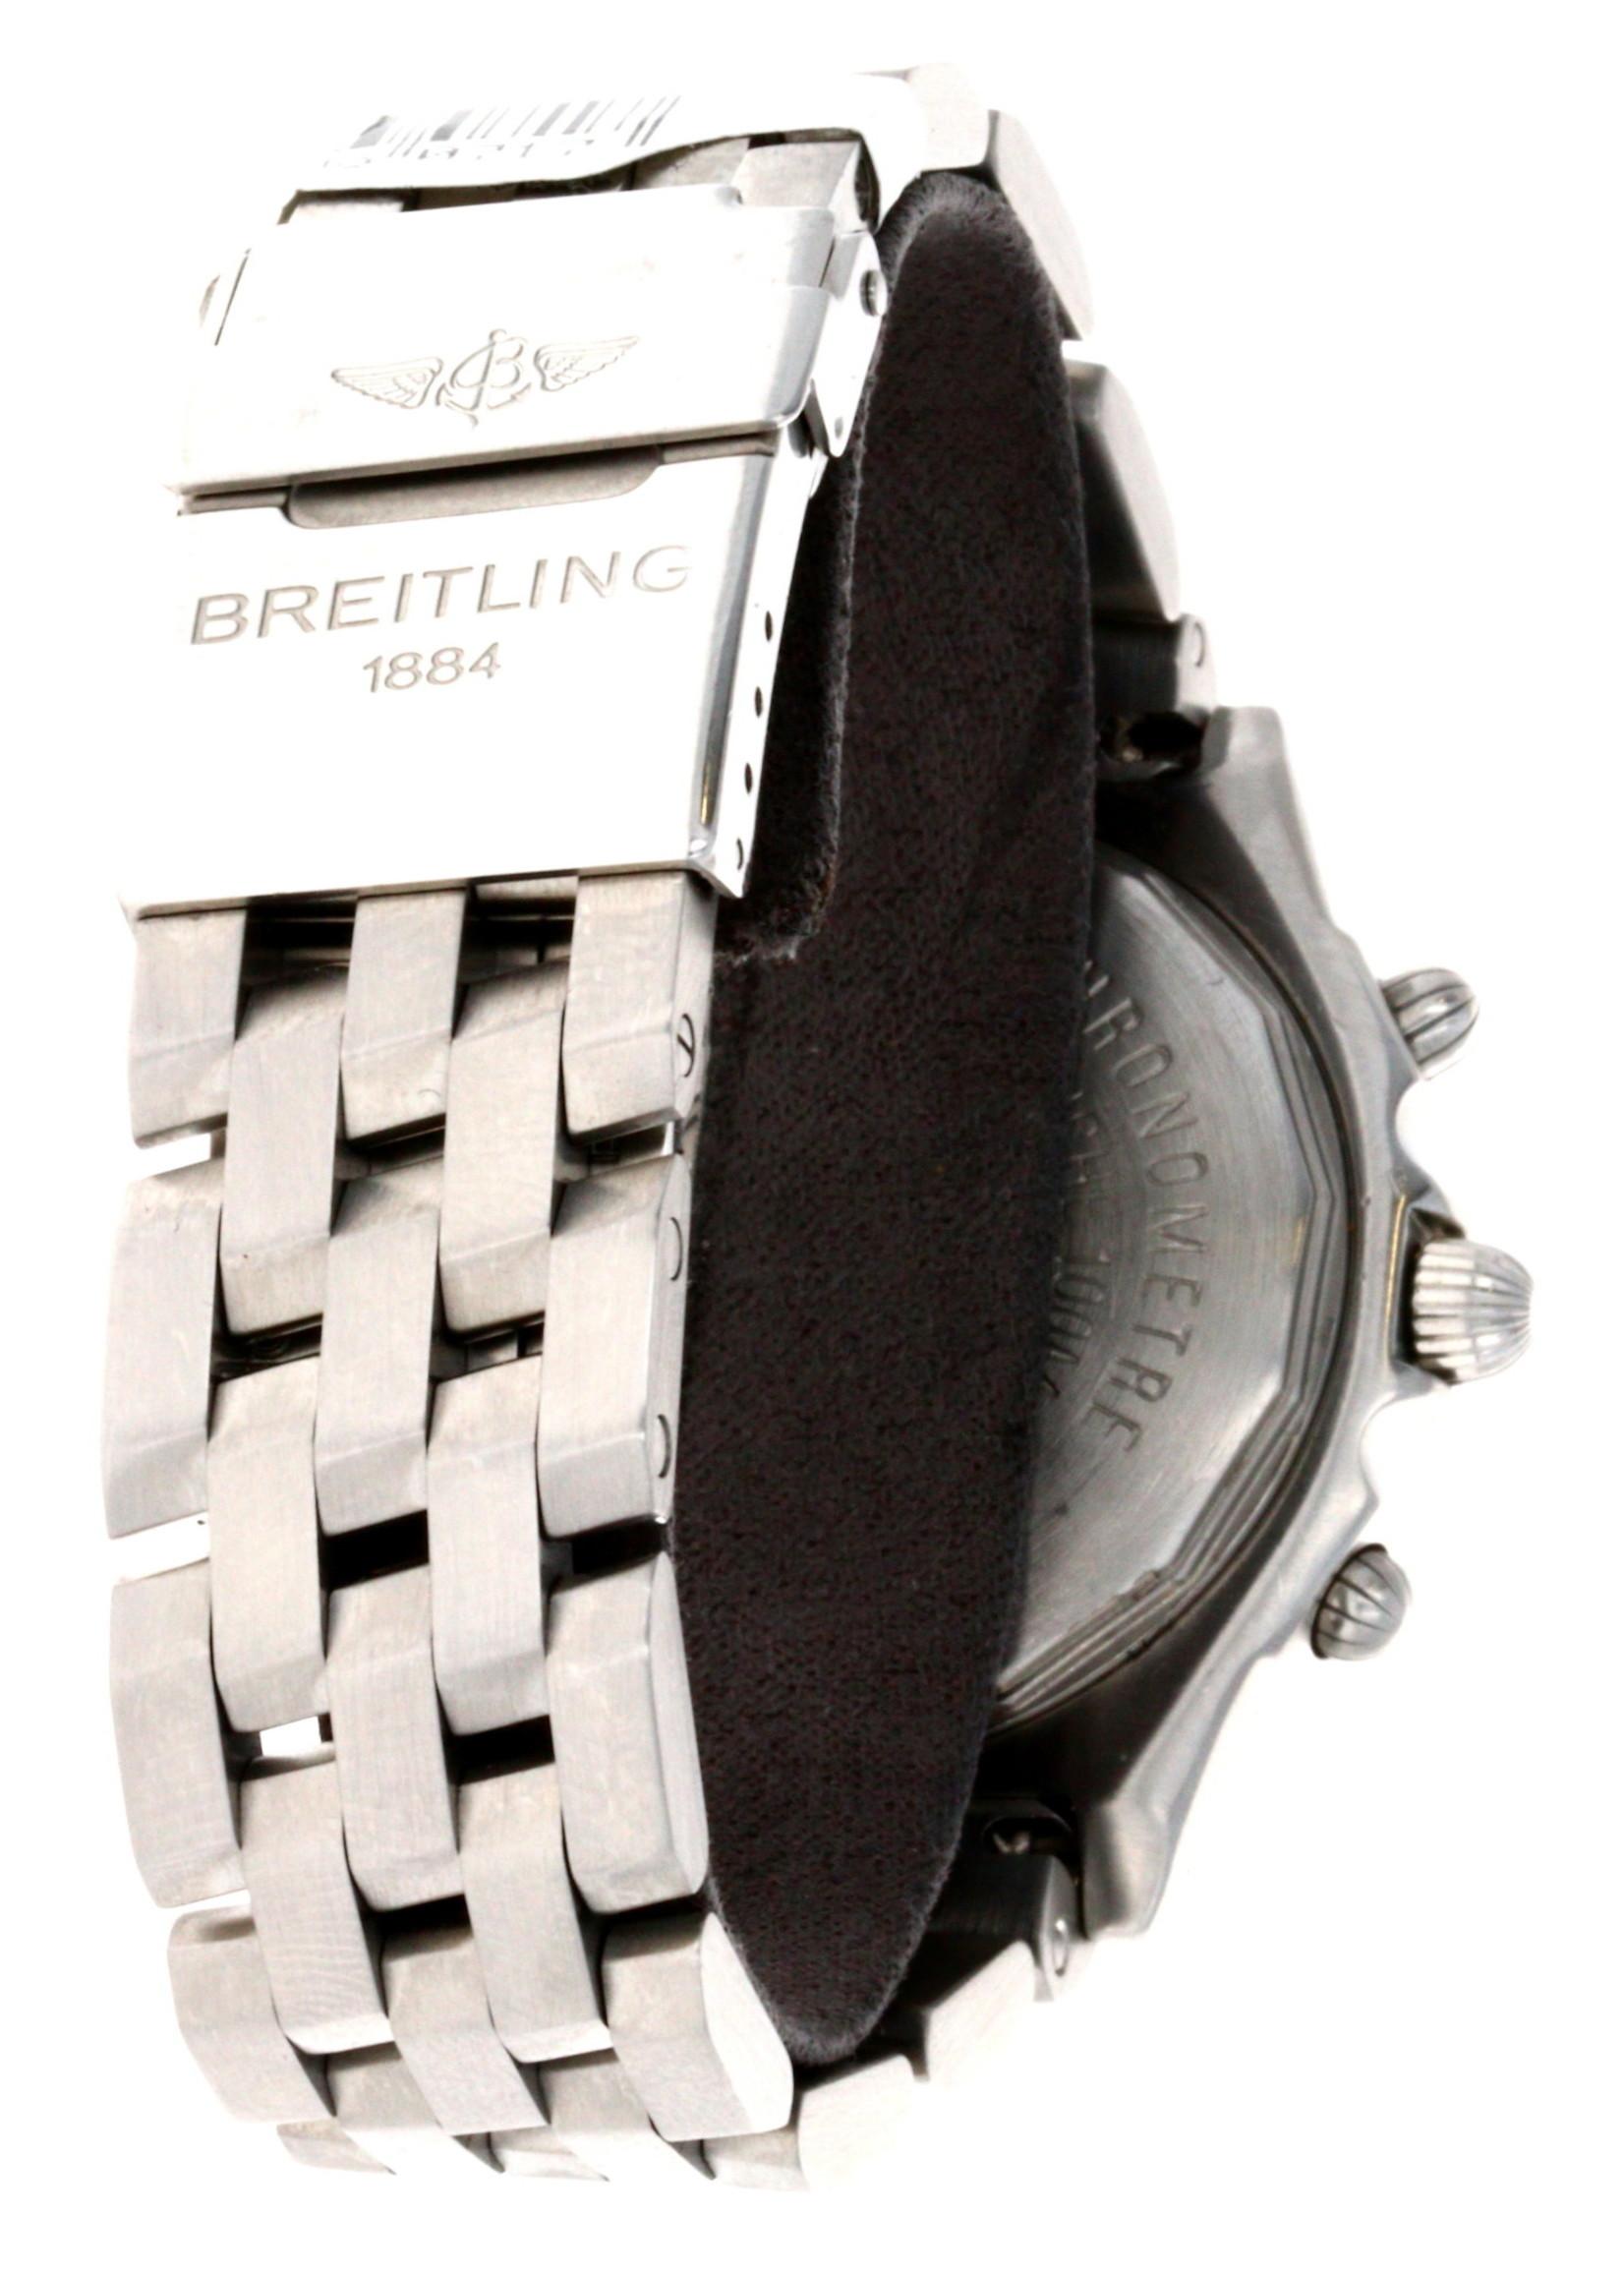 Breitling BREITLING BLACK BIRD